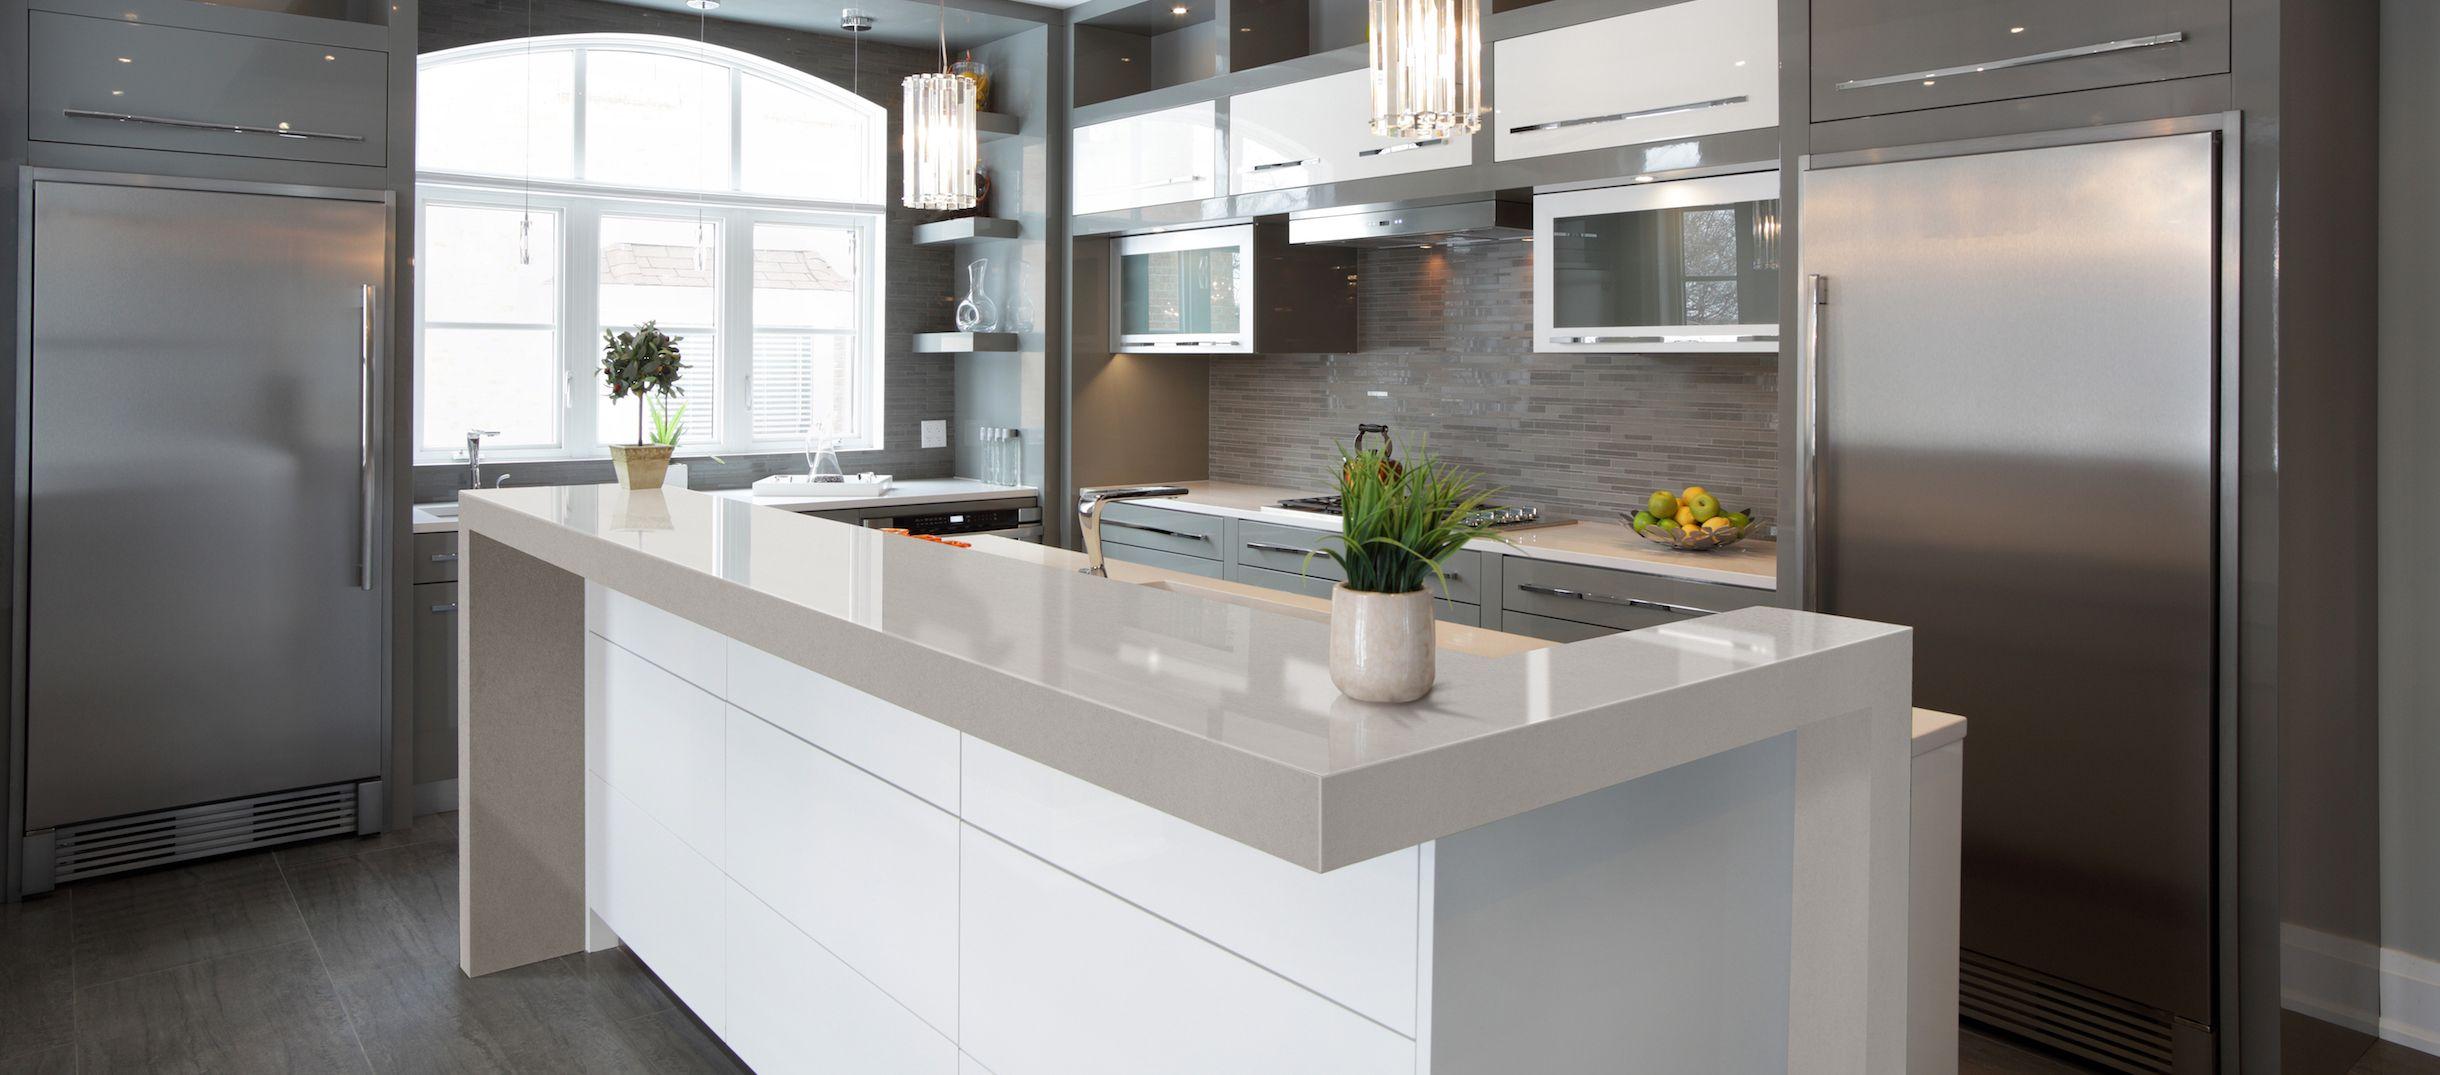 Metropolitan Kitchen Design Kitchen Remodel Countertops